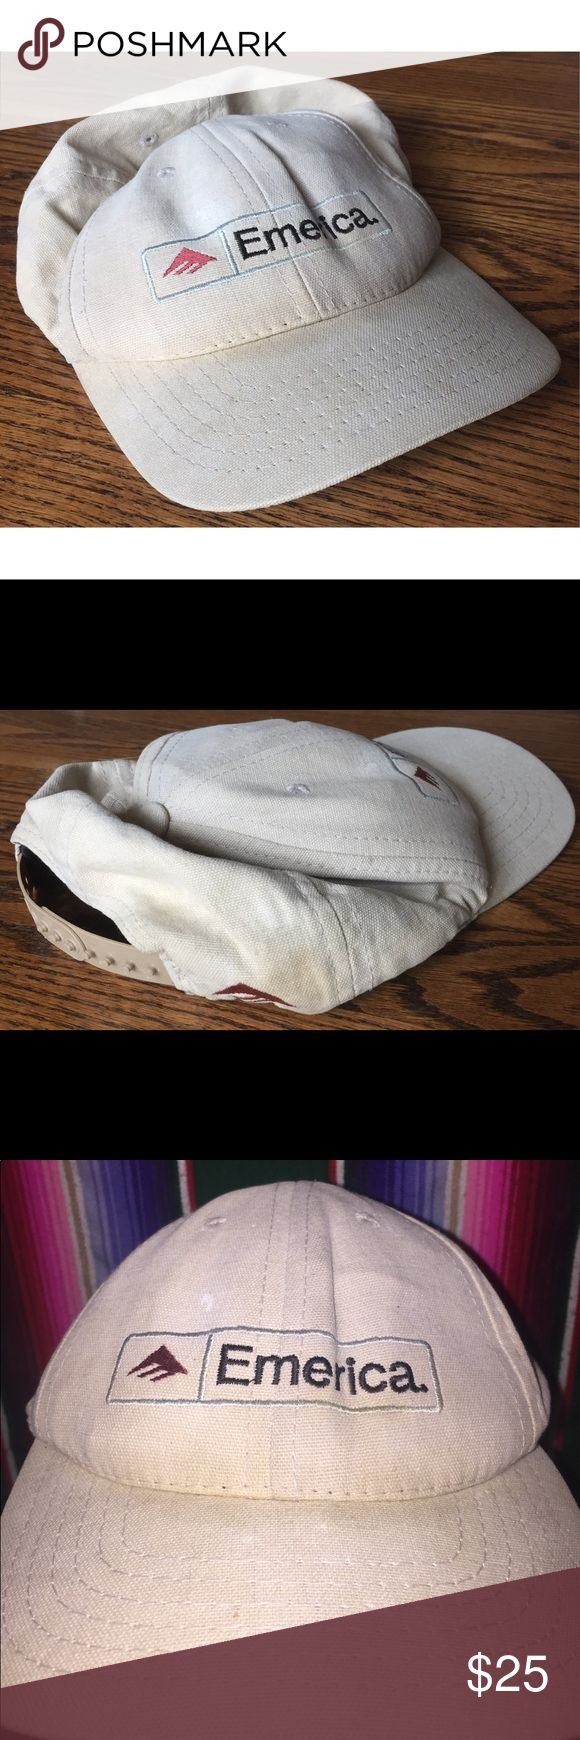 Emerita snapback vintage skateboarding Unisex rare Cool hat slightly worn general used condition fits smaller emerica Accessories Hats